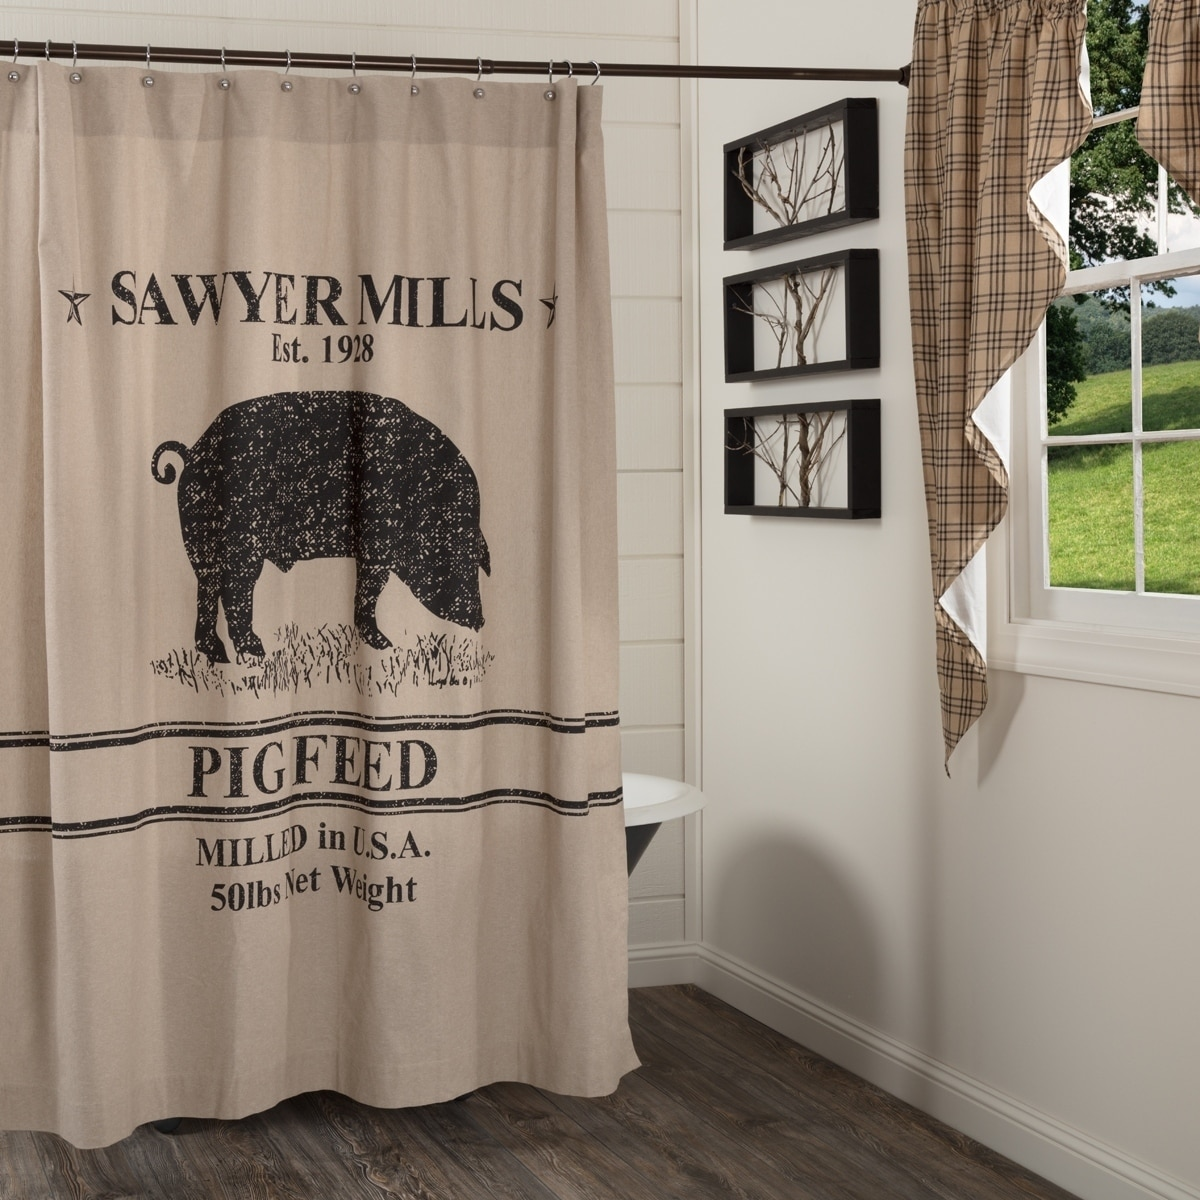 Tan Farmhouse Bath VHC Sawyer Mill Windmill Shower Curtain Rod Pocket Cotton